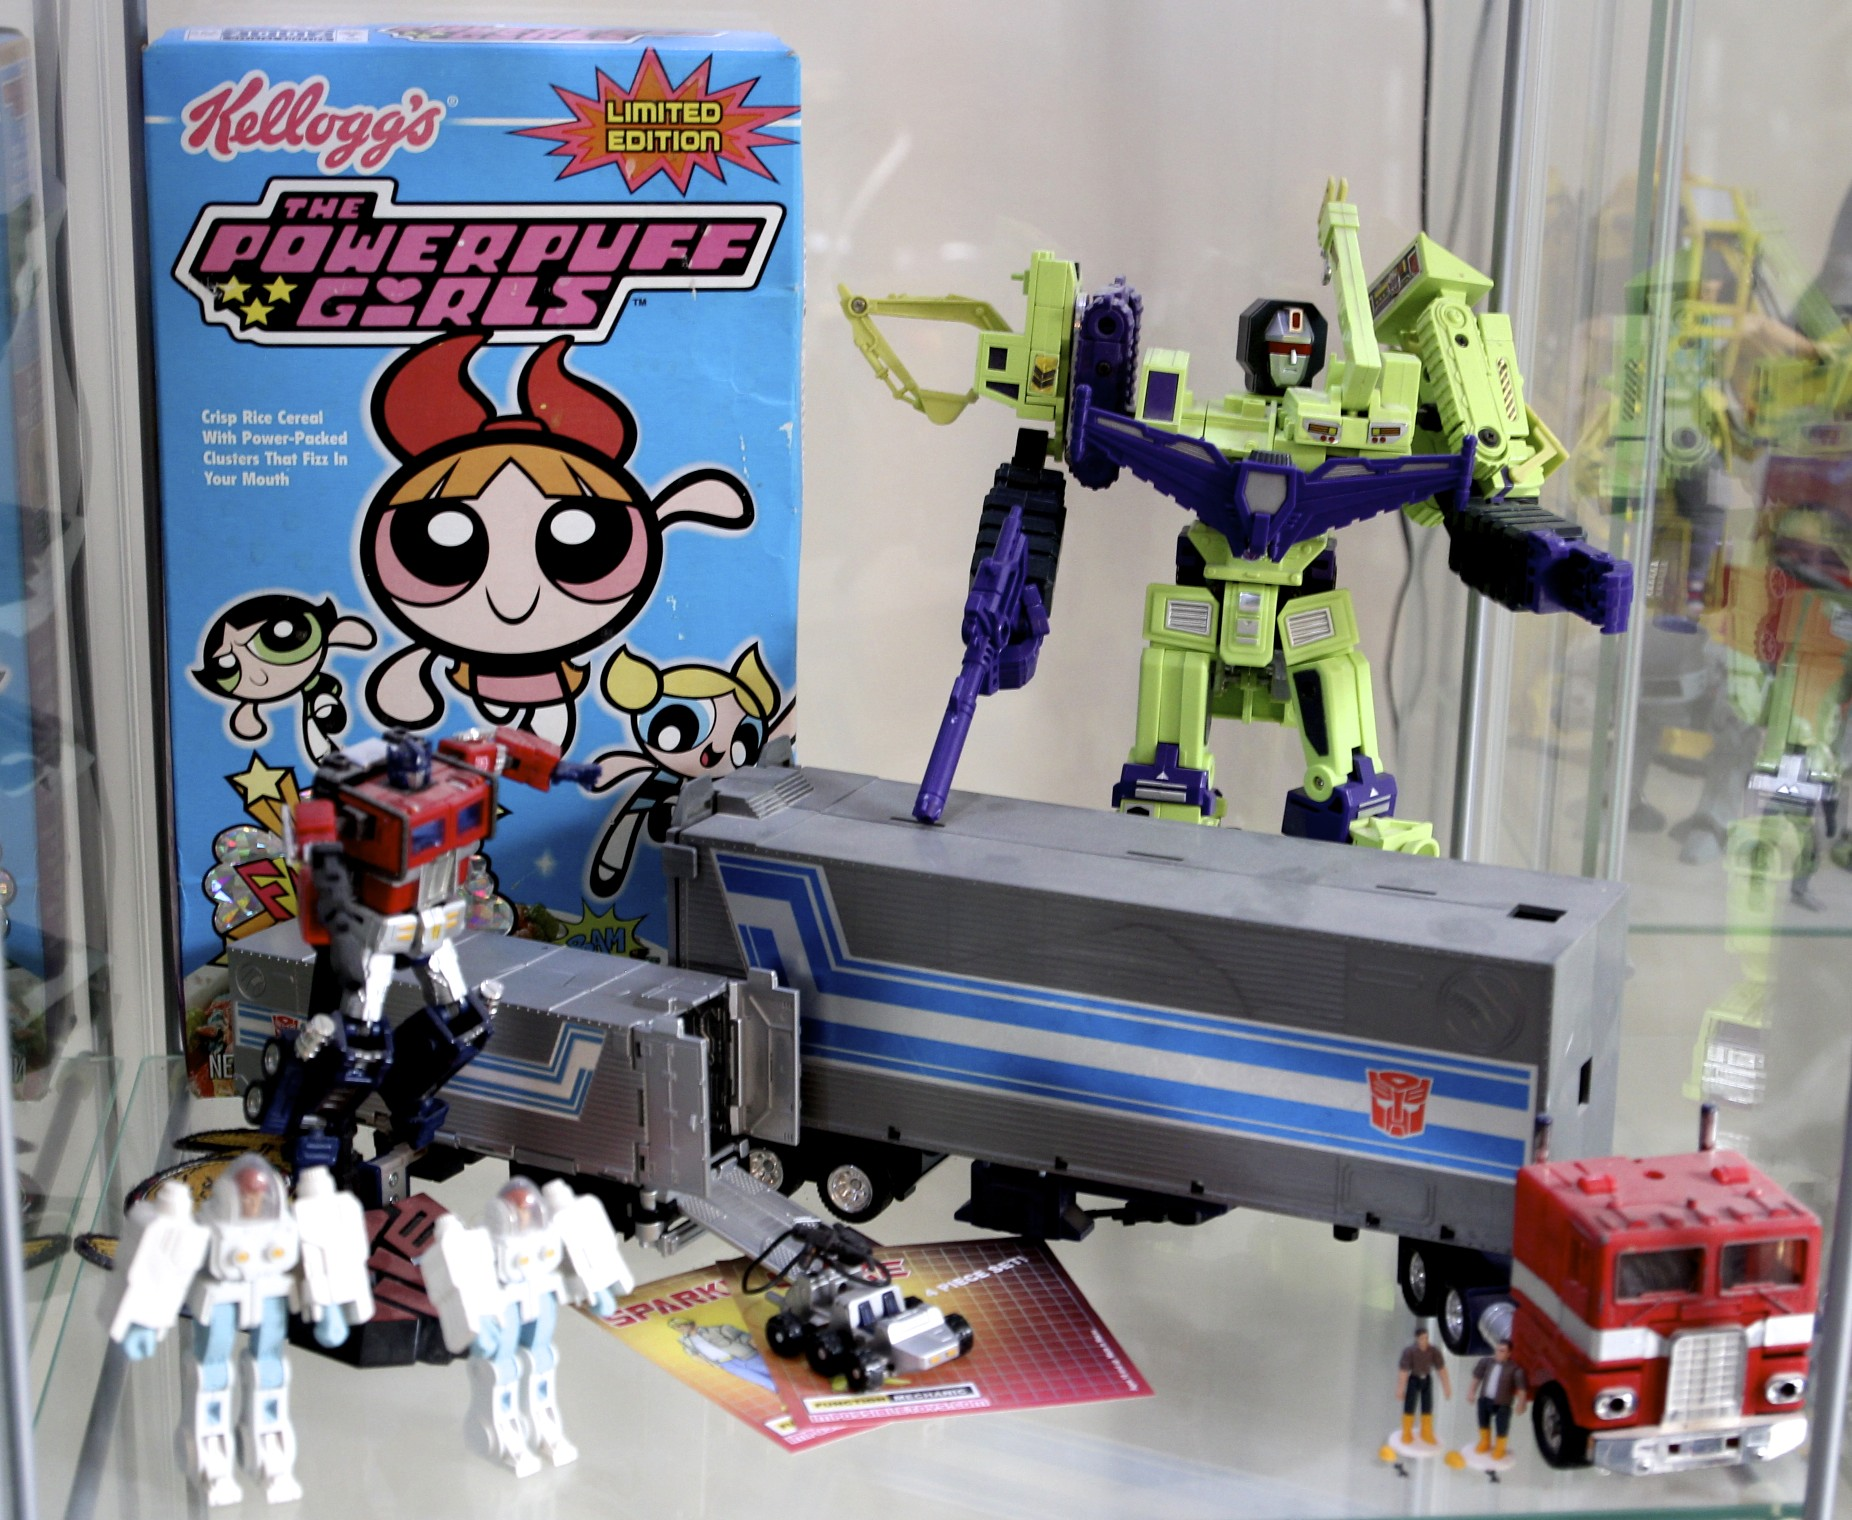 Powerpuff Girls  Cereal, Devestator, Optimus Prime, Original Optimus Prime, ExoSuits, Spike and Sparkplug.